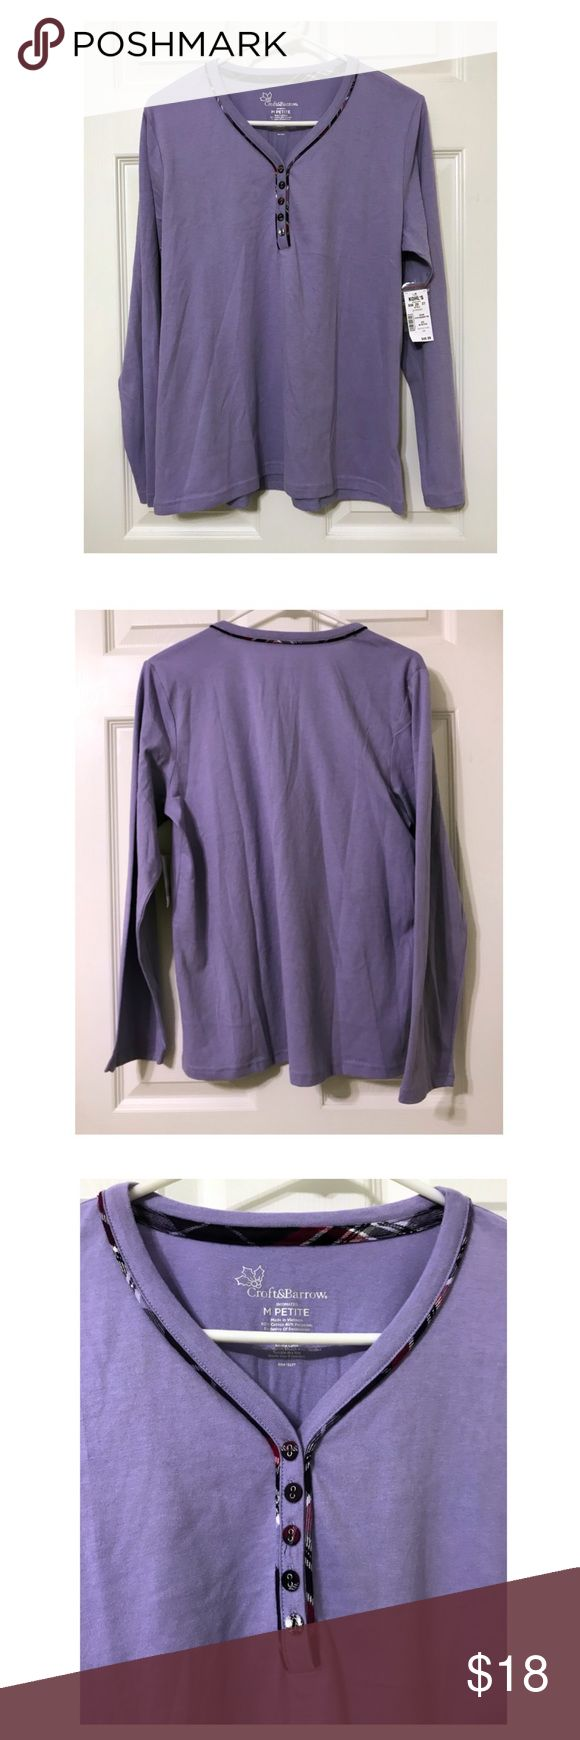 "NWT Croft & Borrow Cozy Purple Long Sleeve Top NWT Croft & Borrow Cozy Purple Long Sleeve Top  Condition: NWT Approximate Measurements: Size medium petite Width-19.5"" Length-24"" croft & barrow Tops Tees - Long Sleeve"